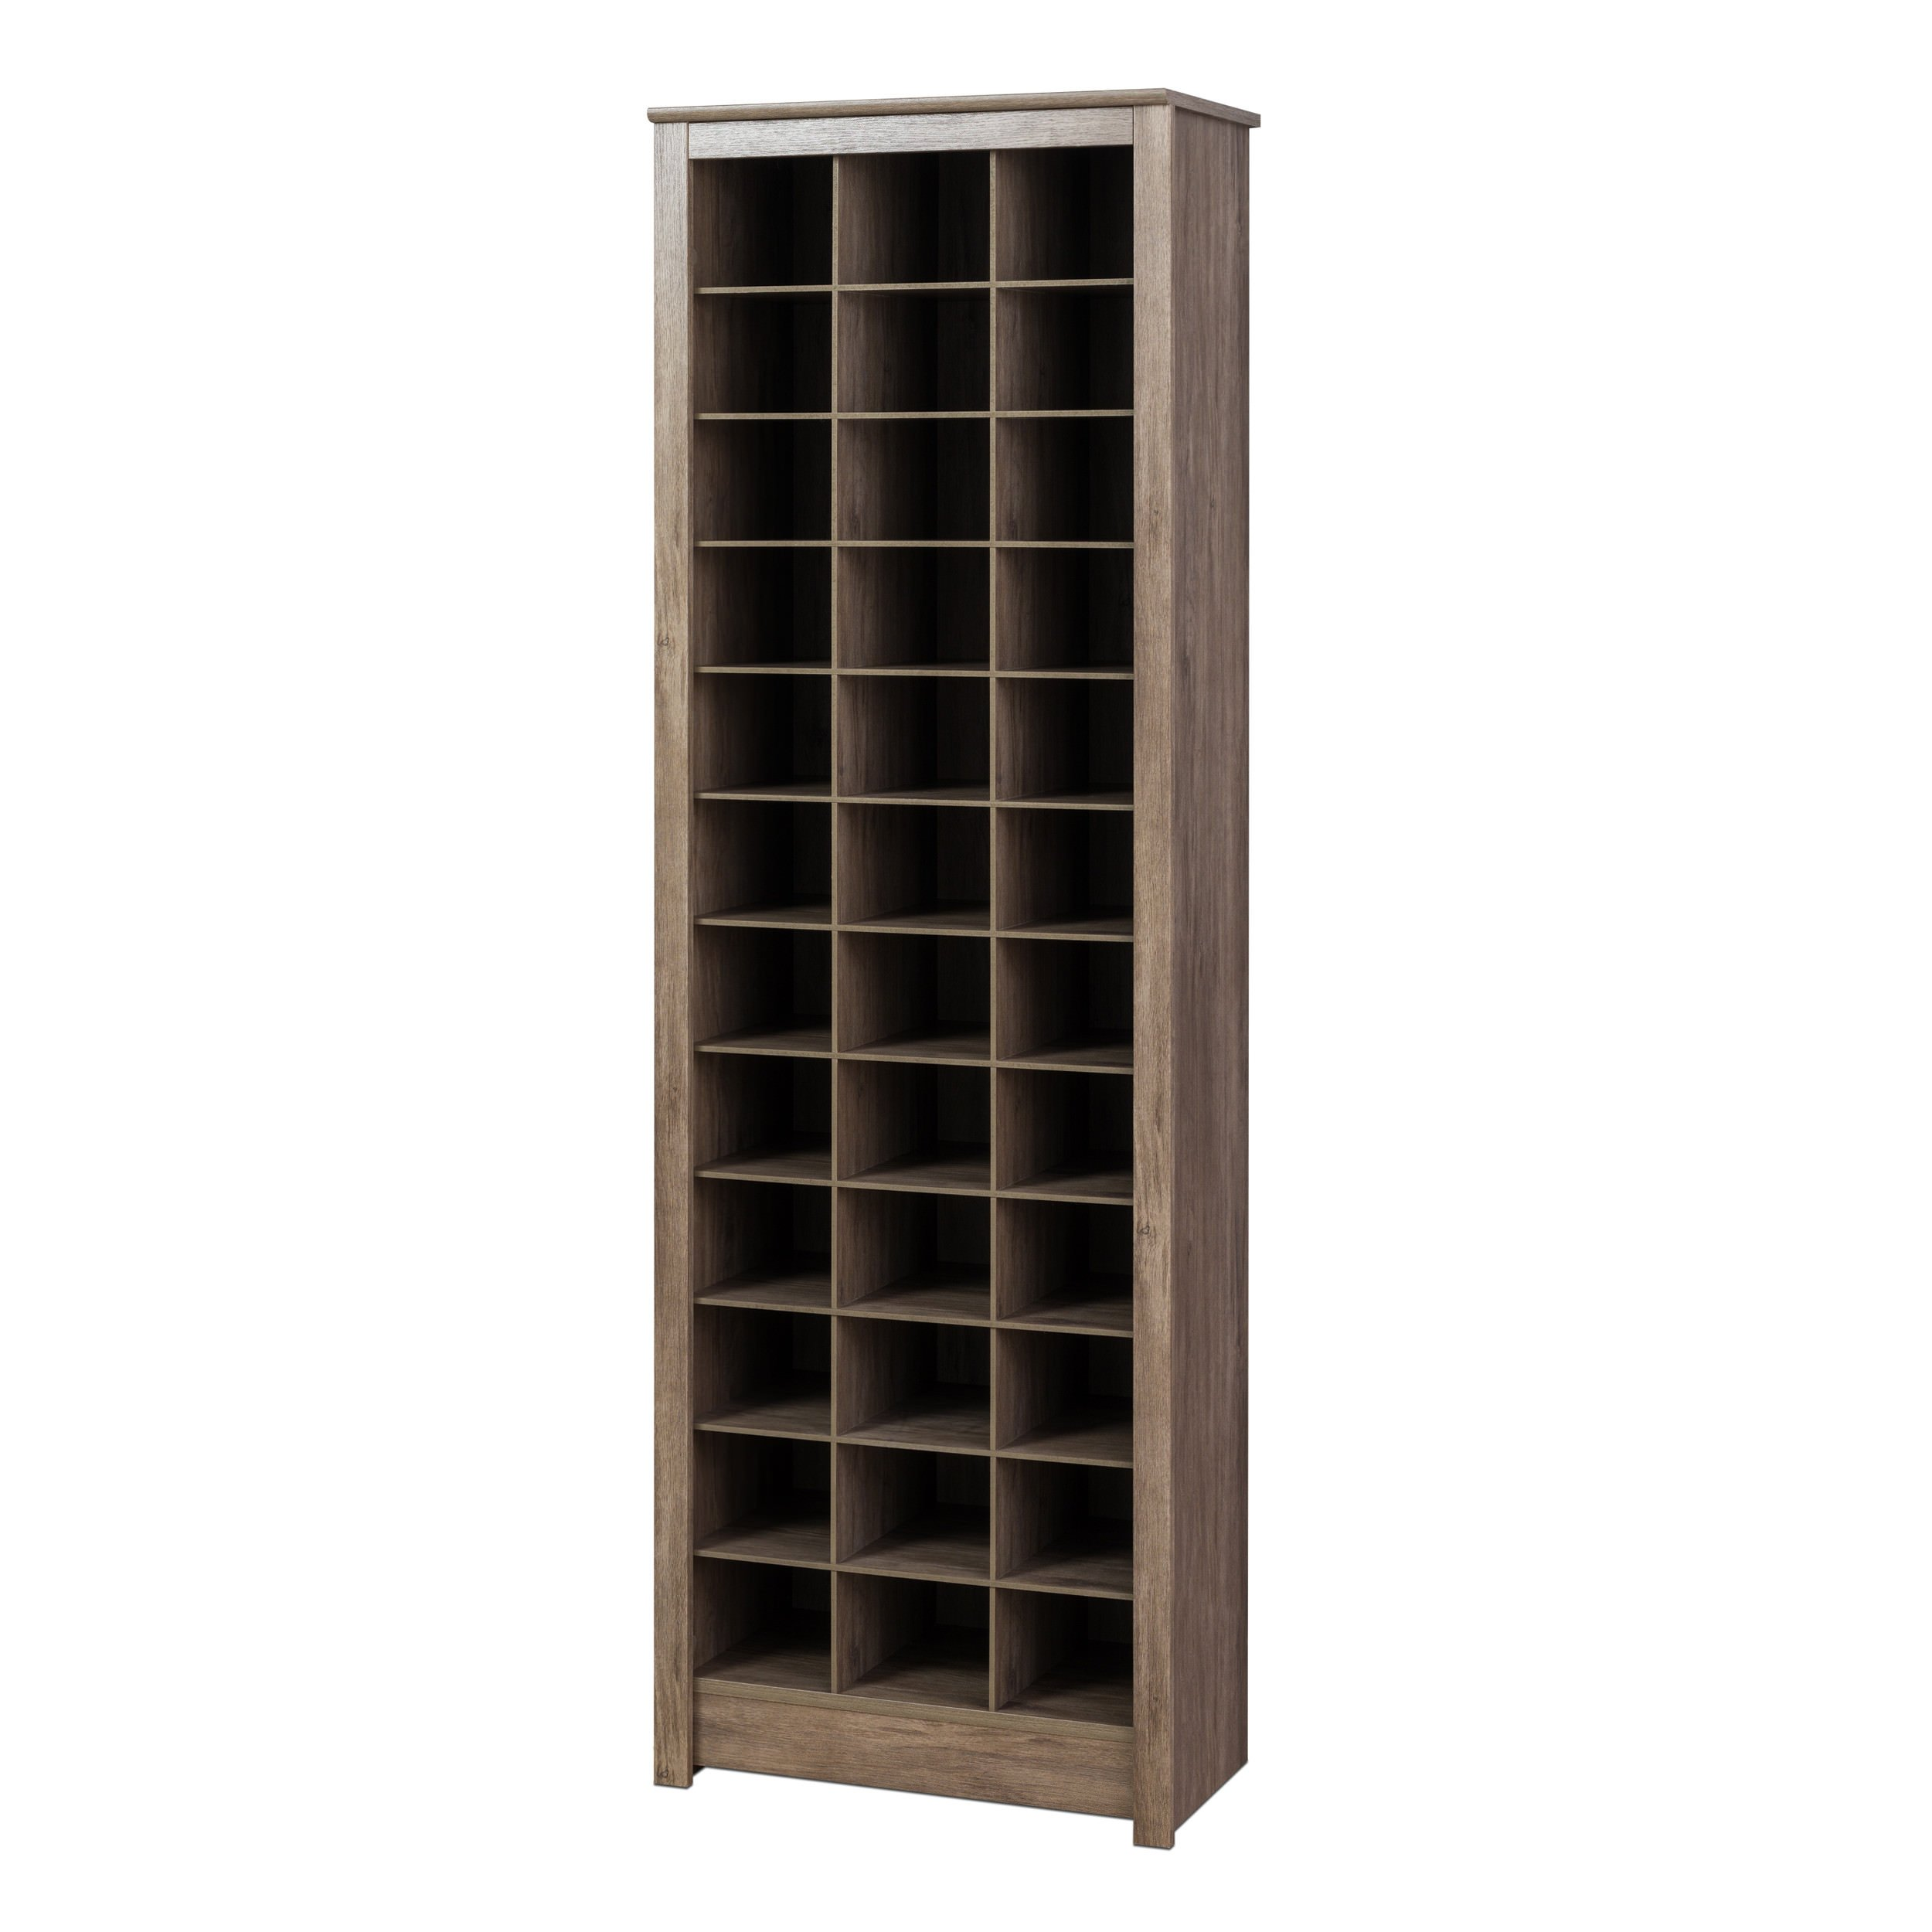 Prepac DUSR-0009-1 Shoe Storage Cabinet, Drifted Gray